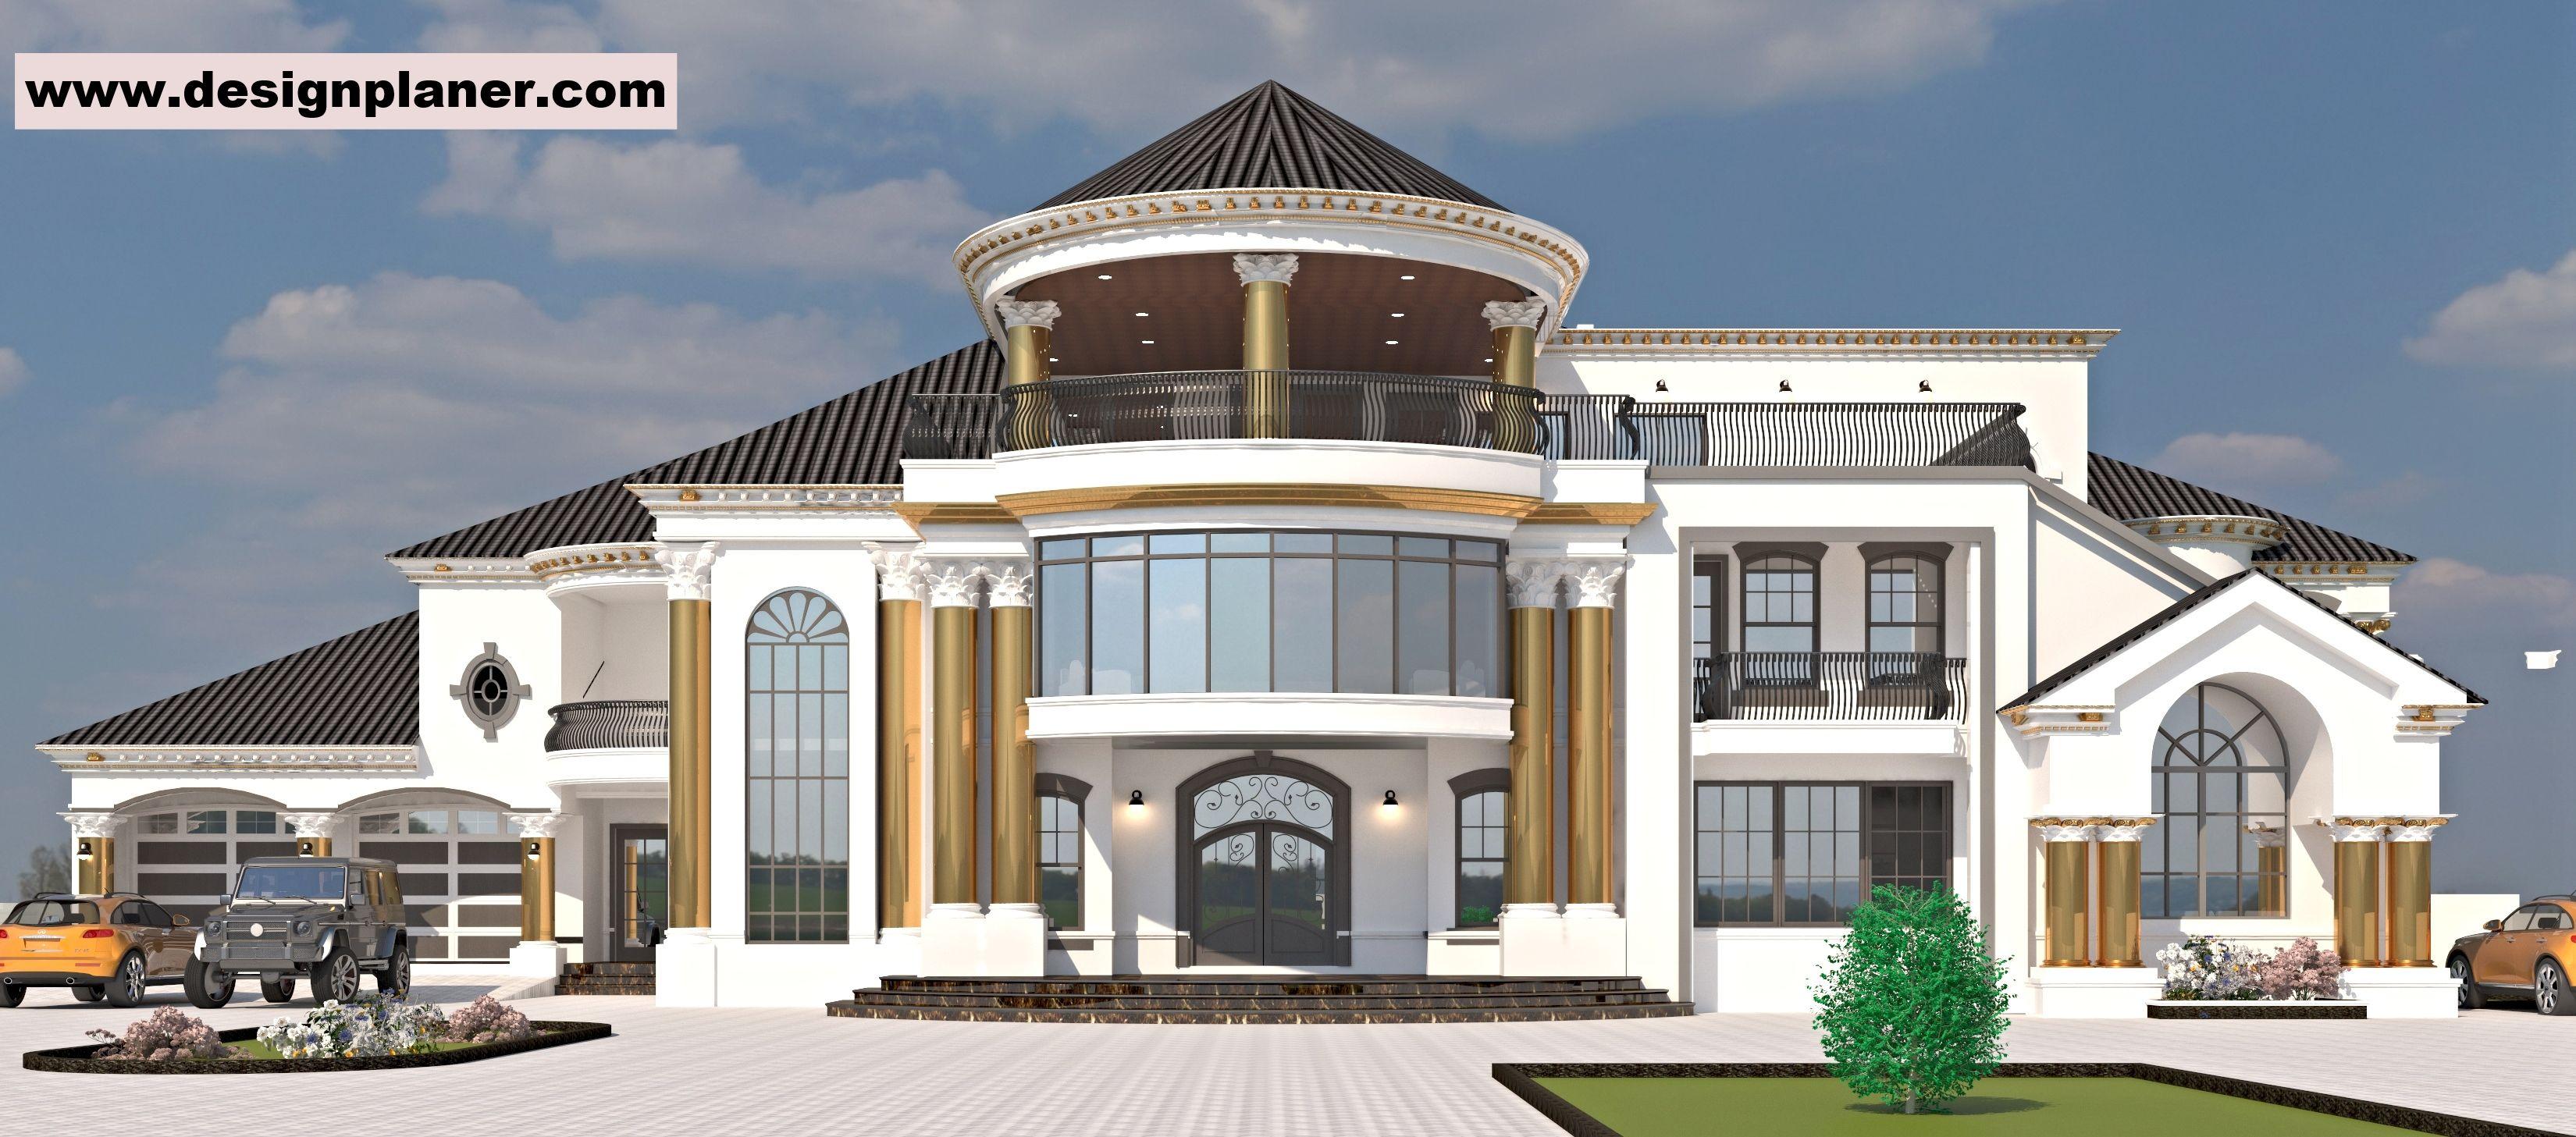 We Design Build Beautiful House Plans Modern Architecture Building Modern Bungalow House